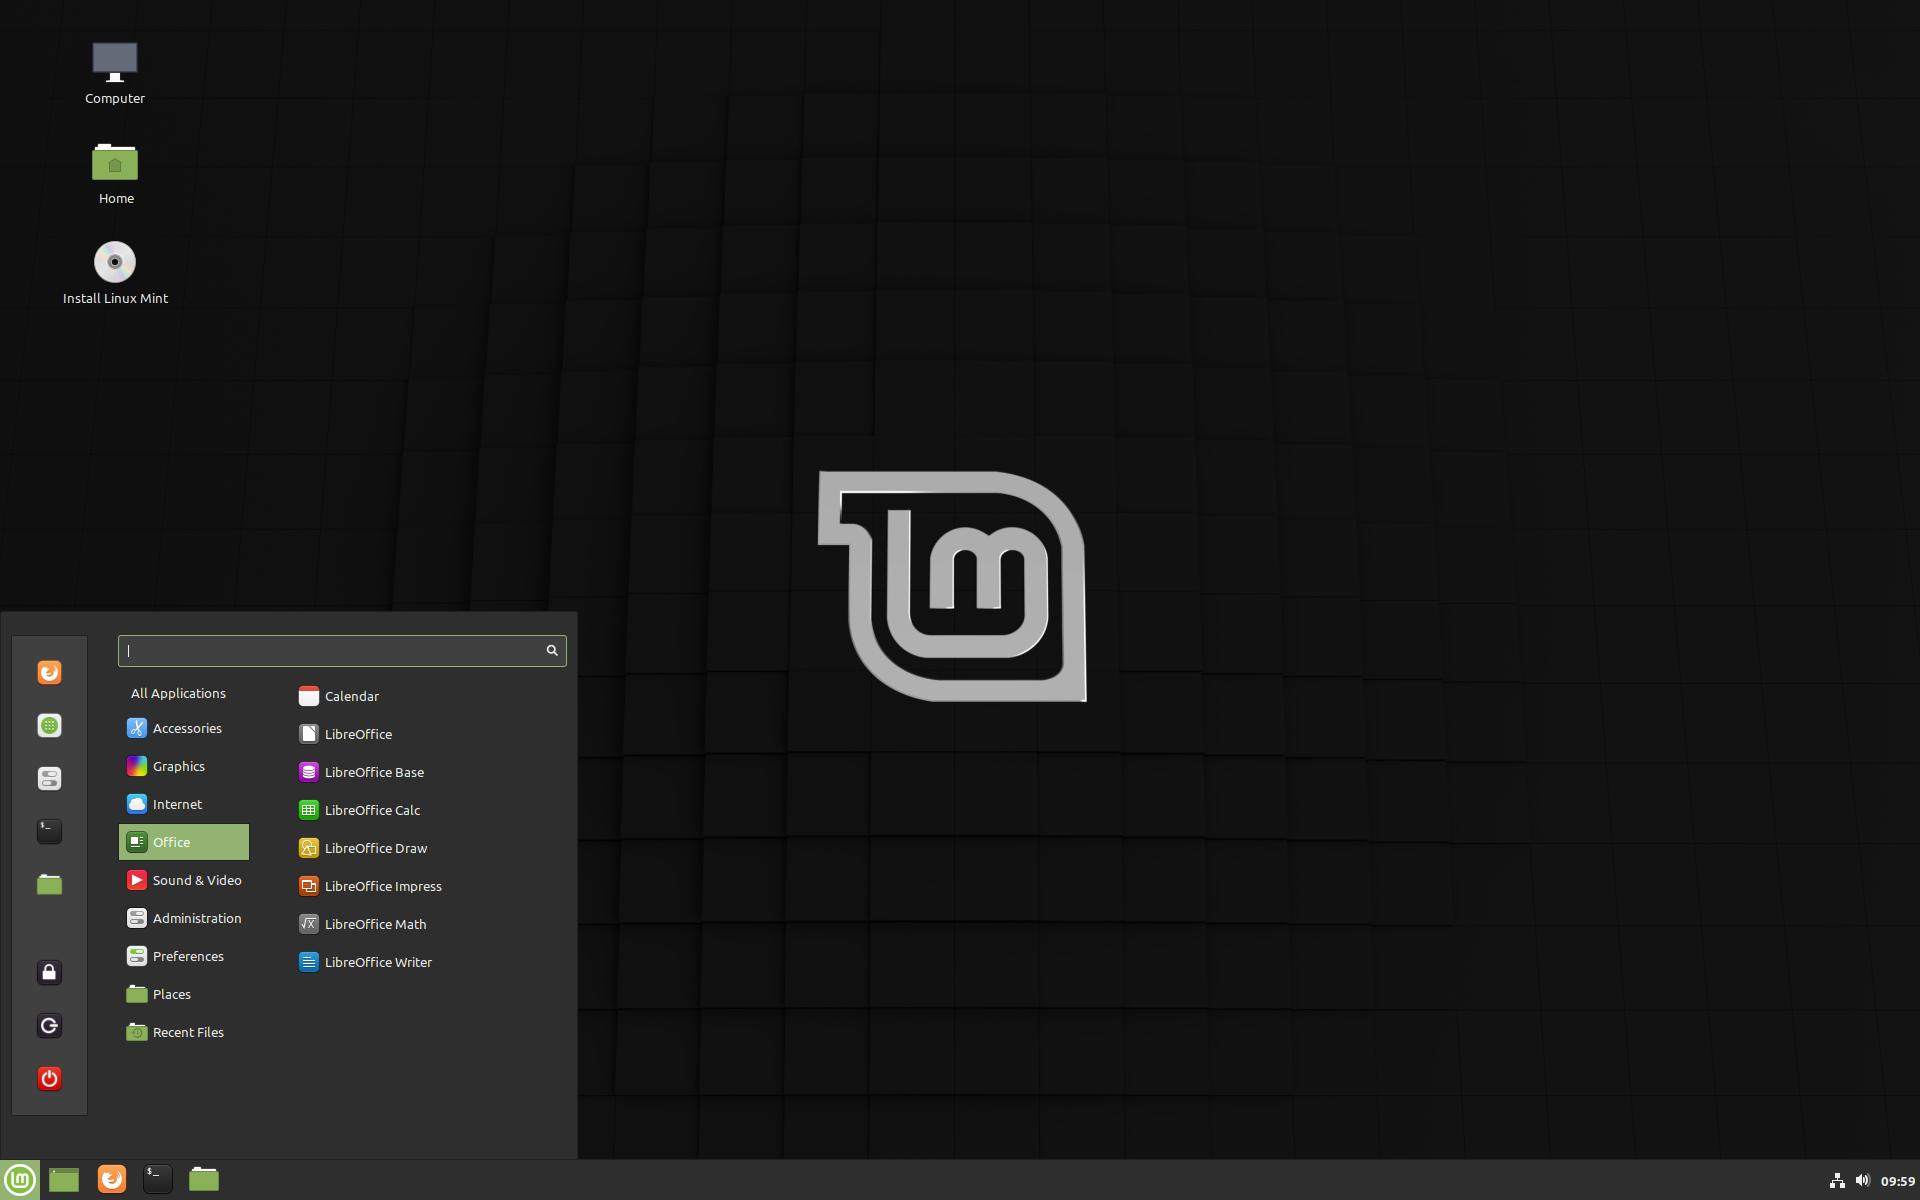 cinnamon - Linux Mint 20.1 Ulyssa ανακοινώθηκε η επόμενη έκδοση